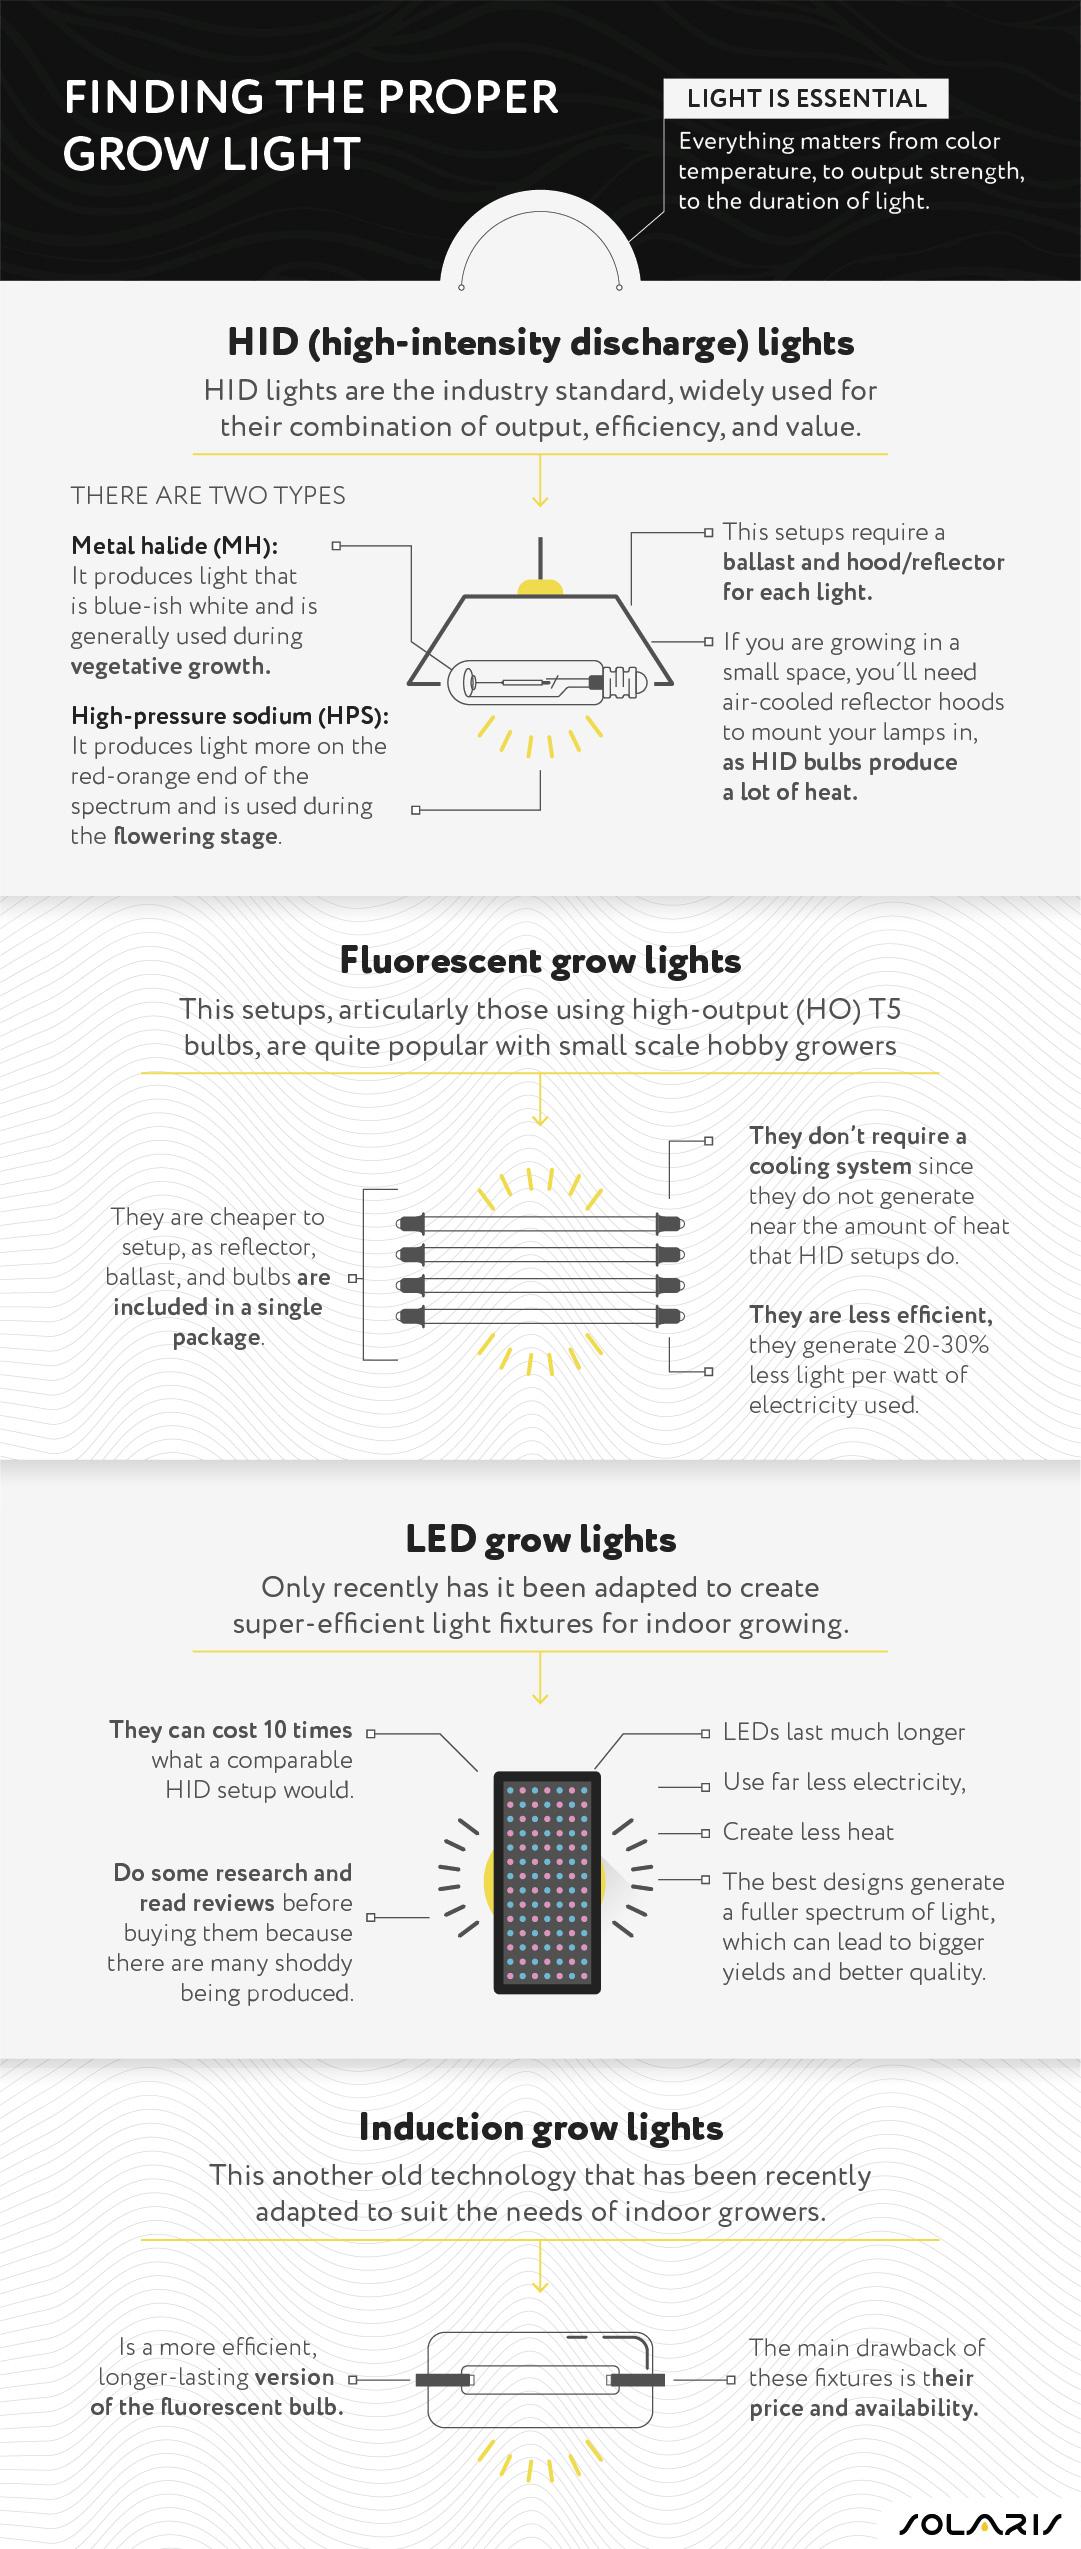 Finding the proper grow light